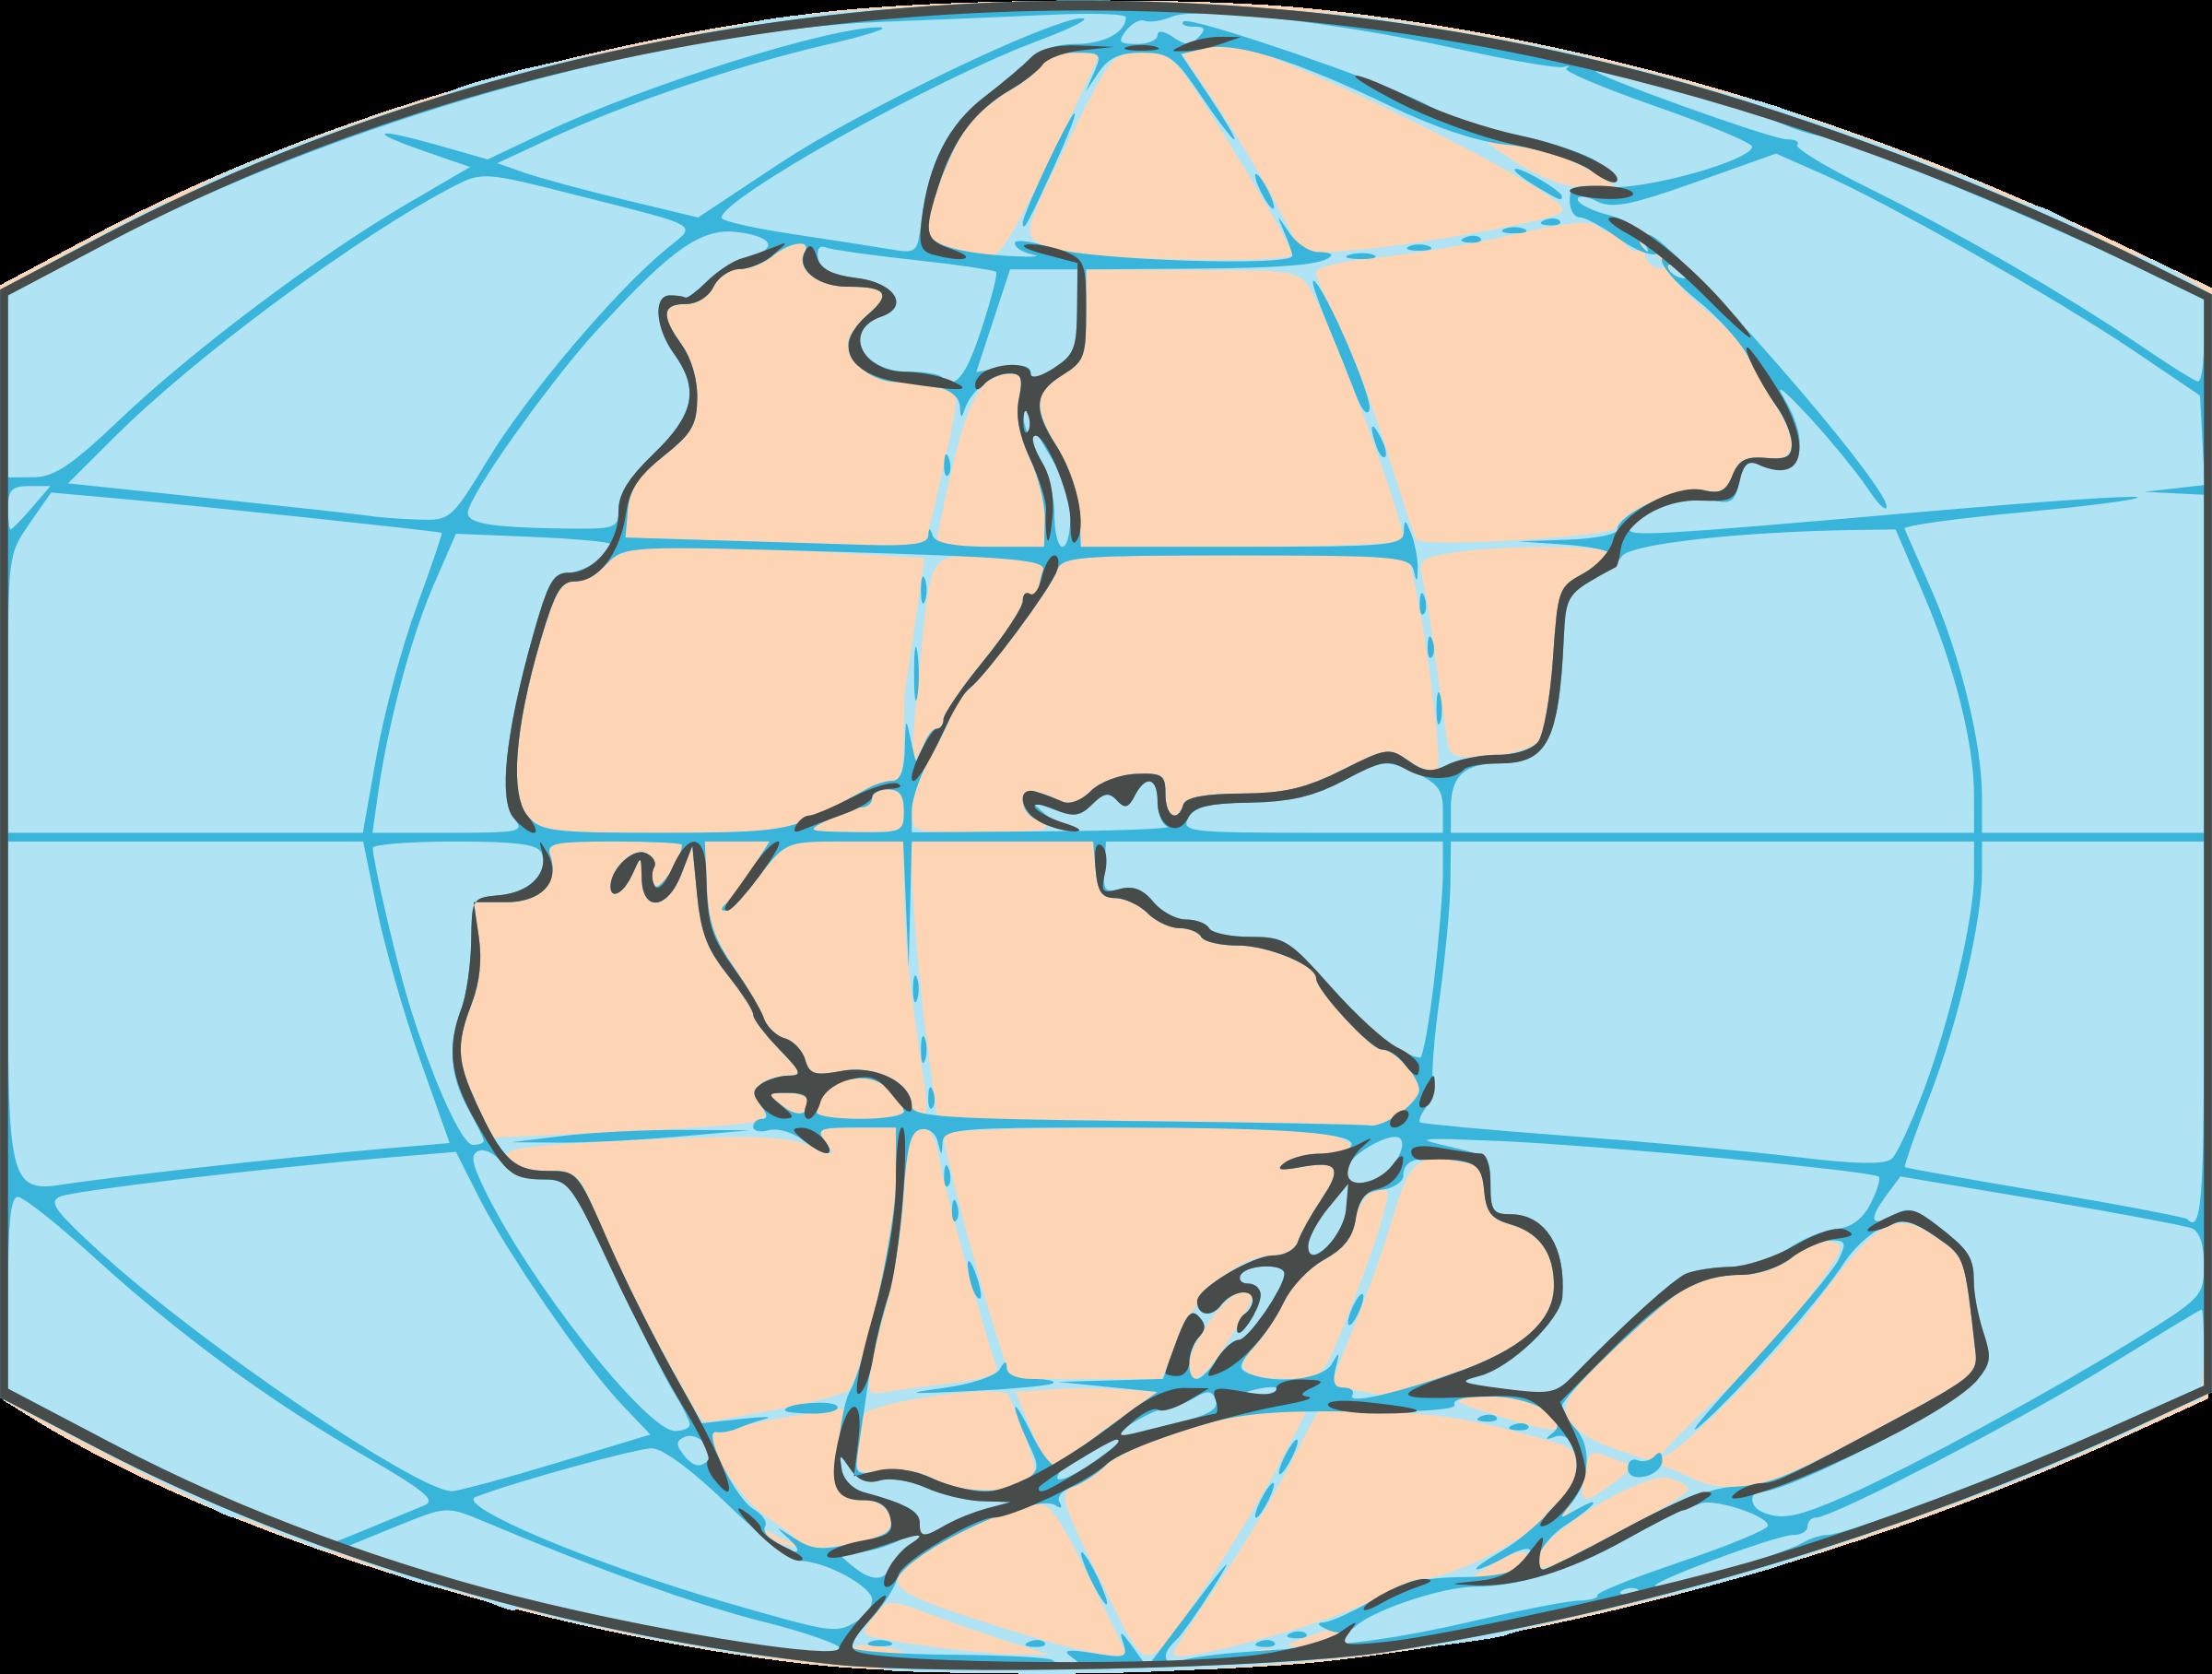 Clipart map public domain. Pangaea